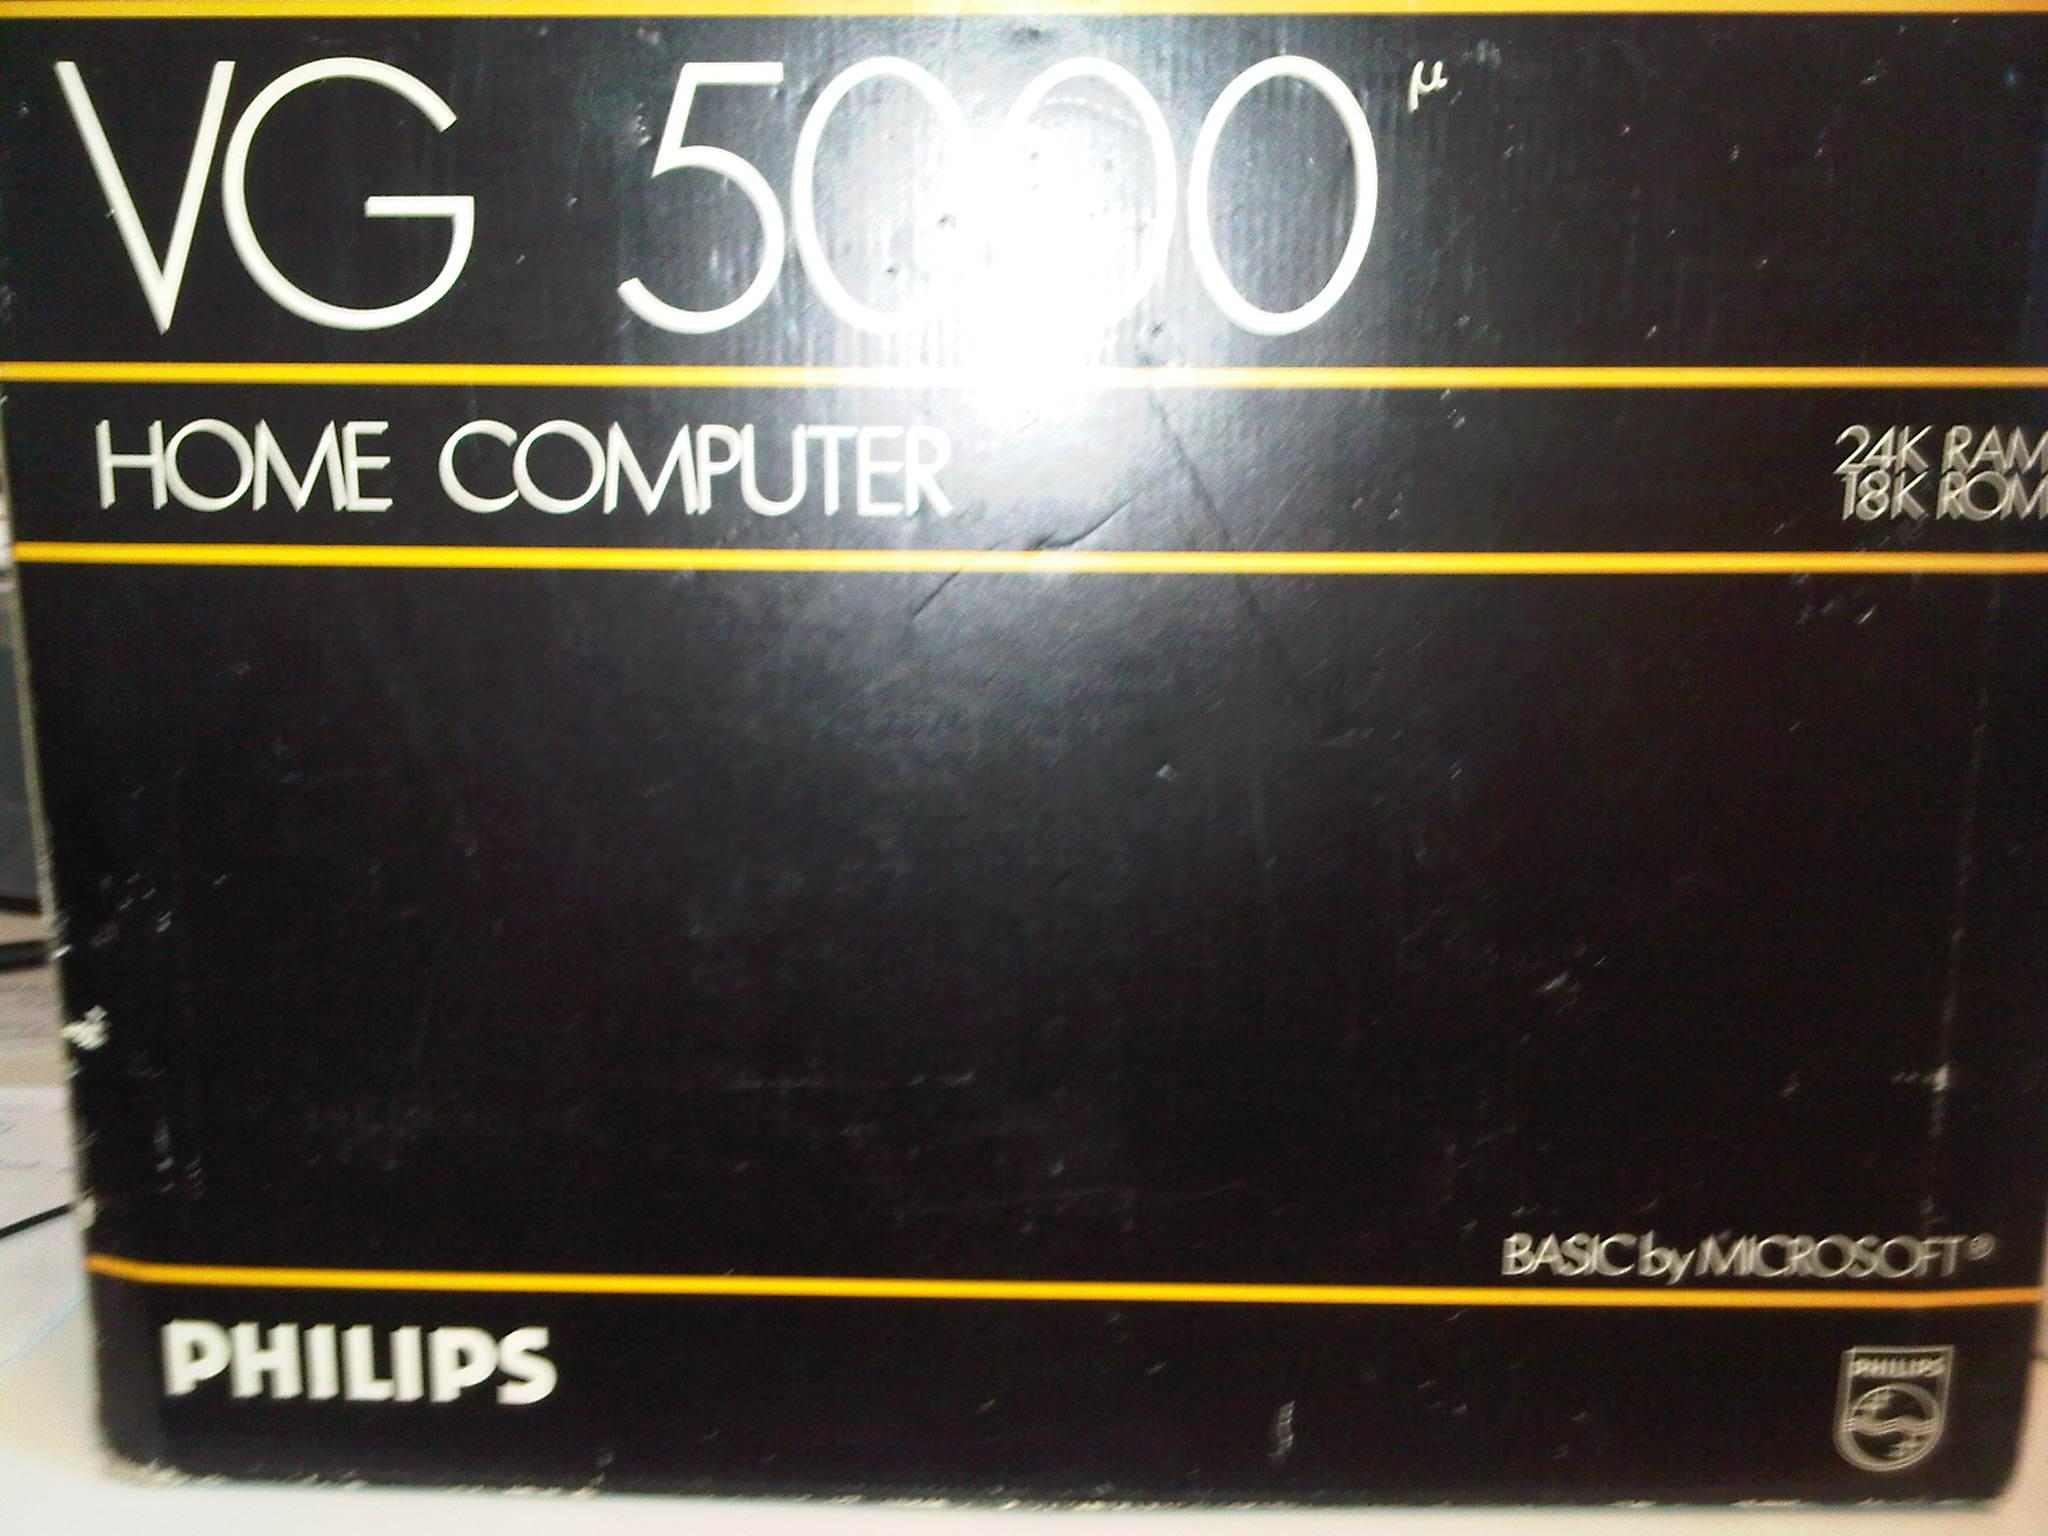 Vds Philips VG 5000 Home computer en boite Img00927-20130424-1230-4374e76